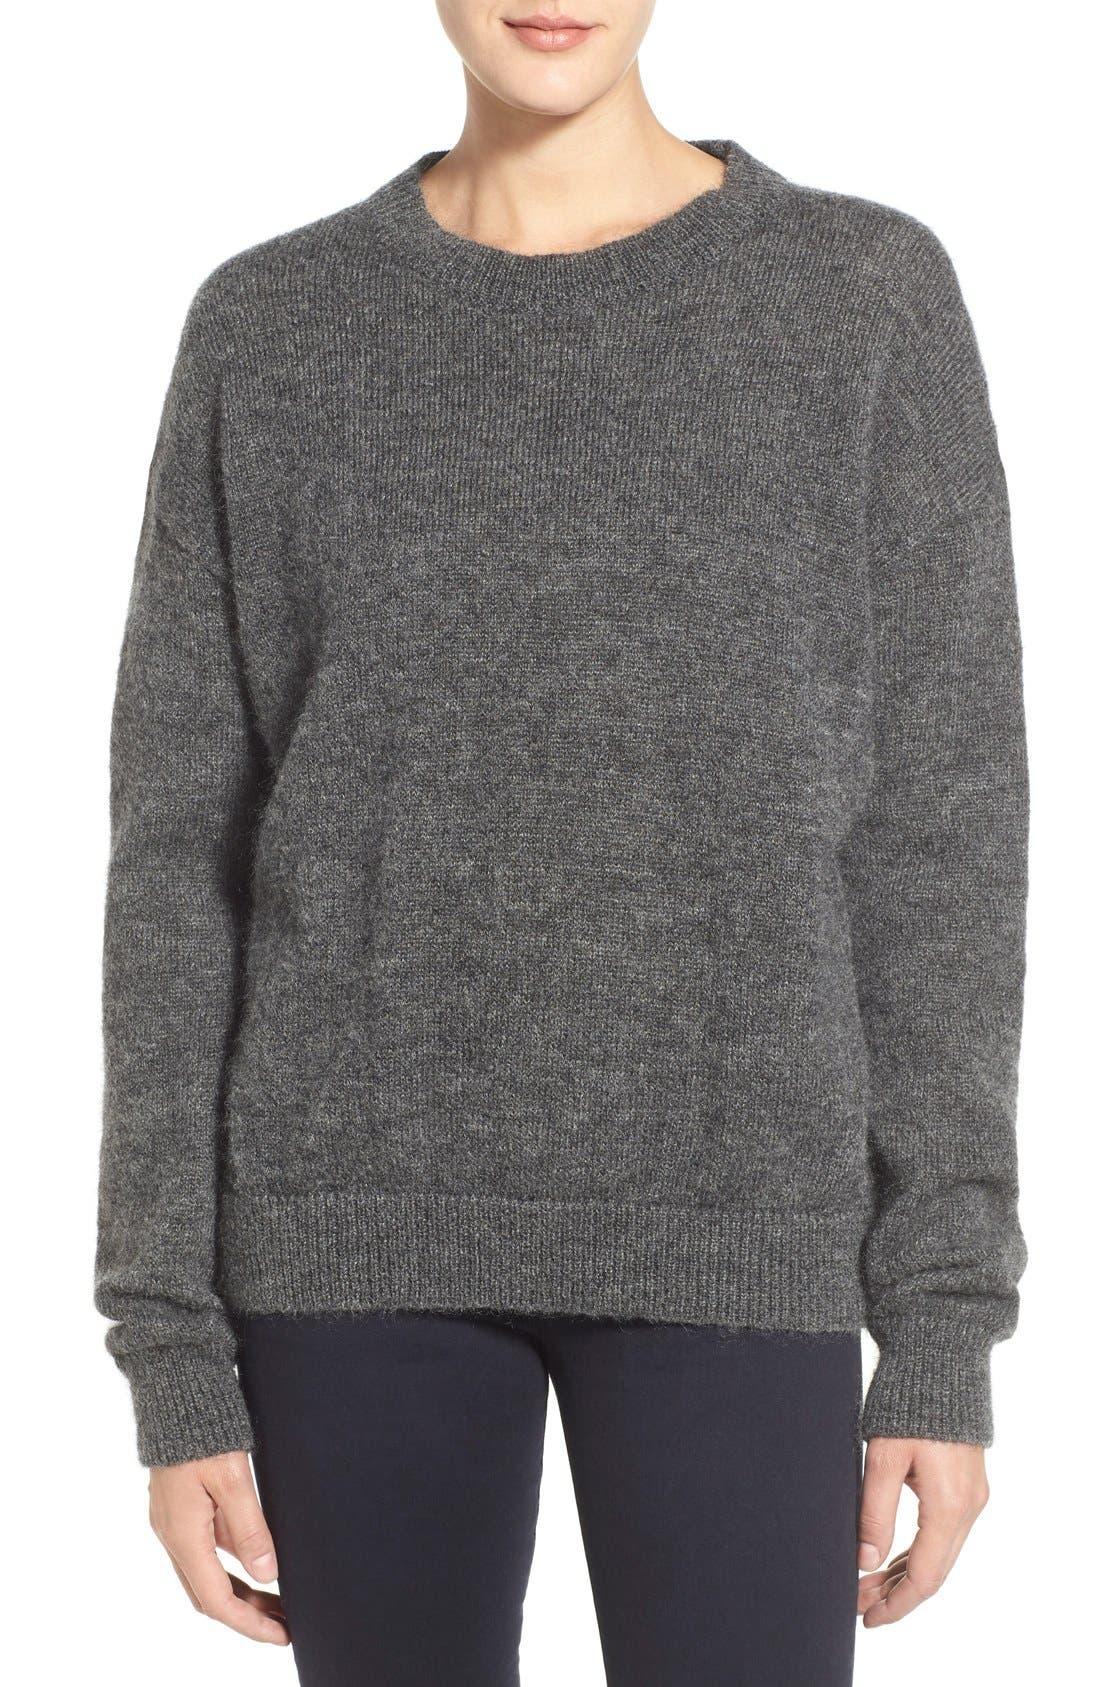 Main Image - M.i.h. Jeans 'Delo' Mohair Blend Crewneck Sweater